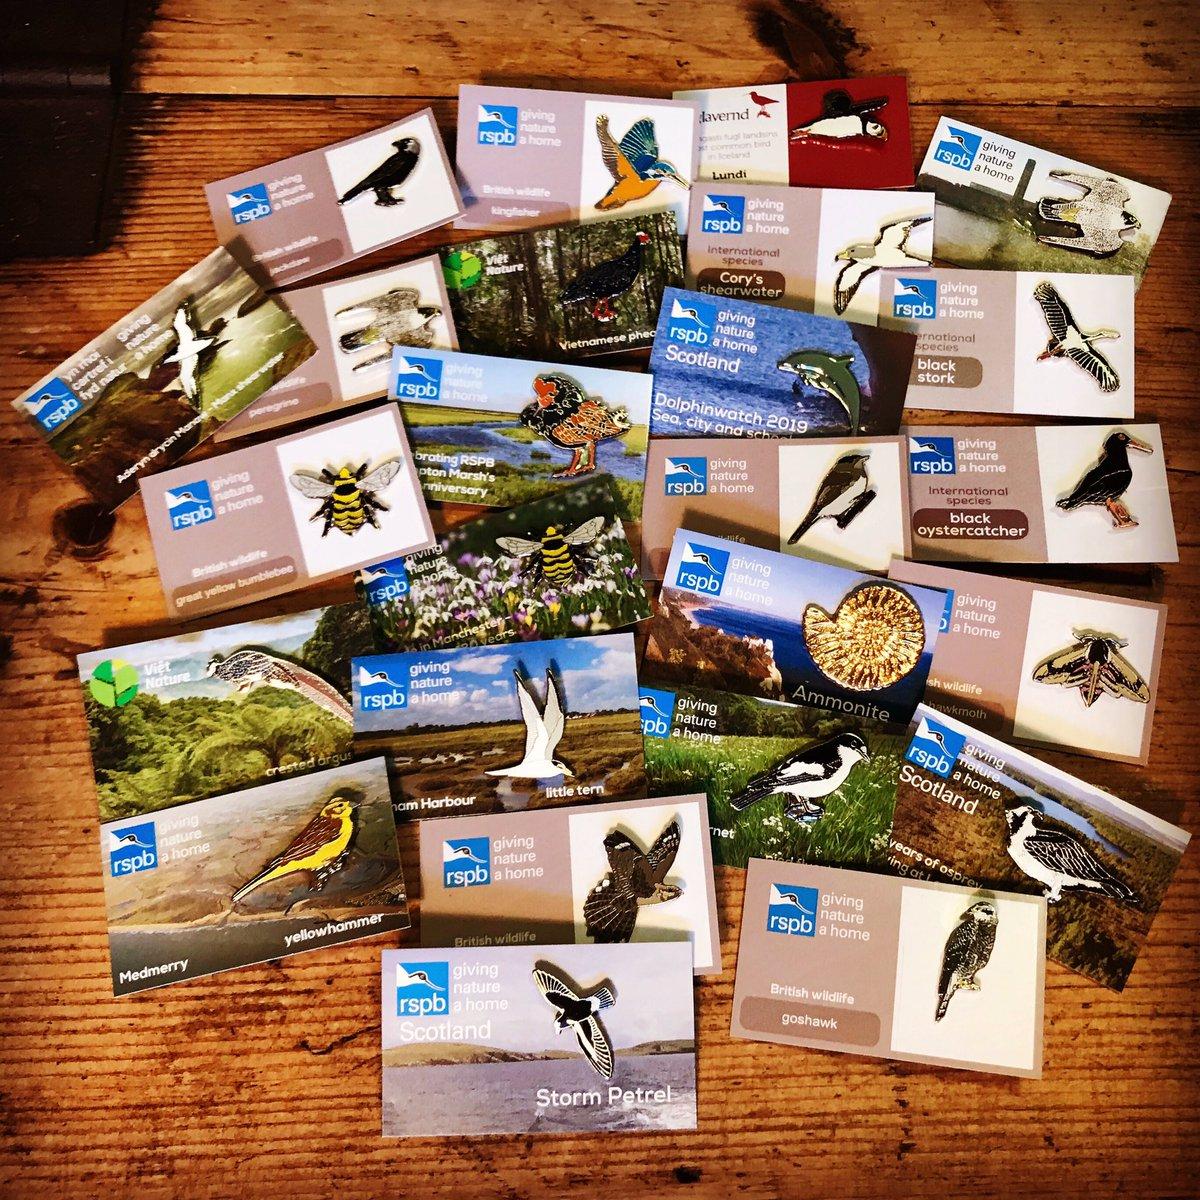 Wildlife pin badge pornography! 🍆🍒 #rspb #pinbadges #rspbpinbadge #rspbpins #sharehowyouwear